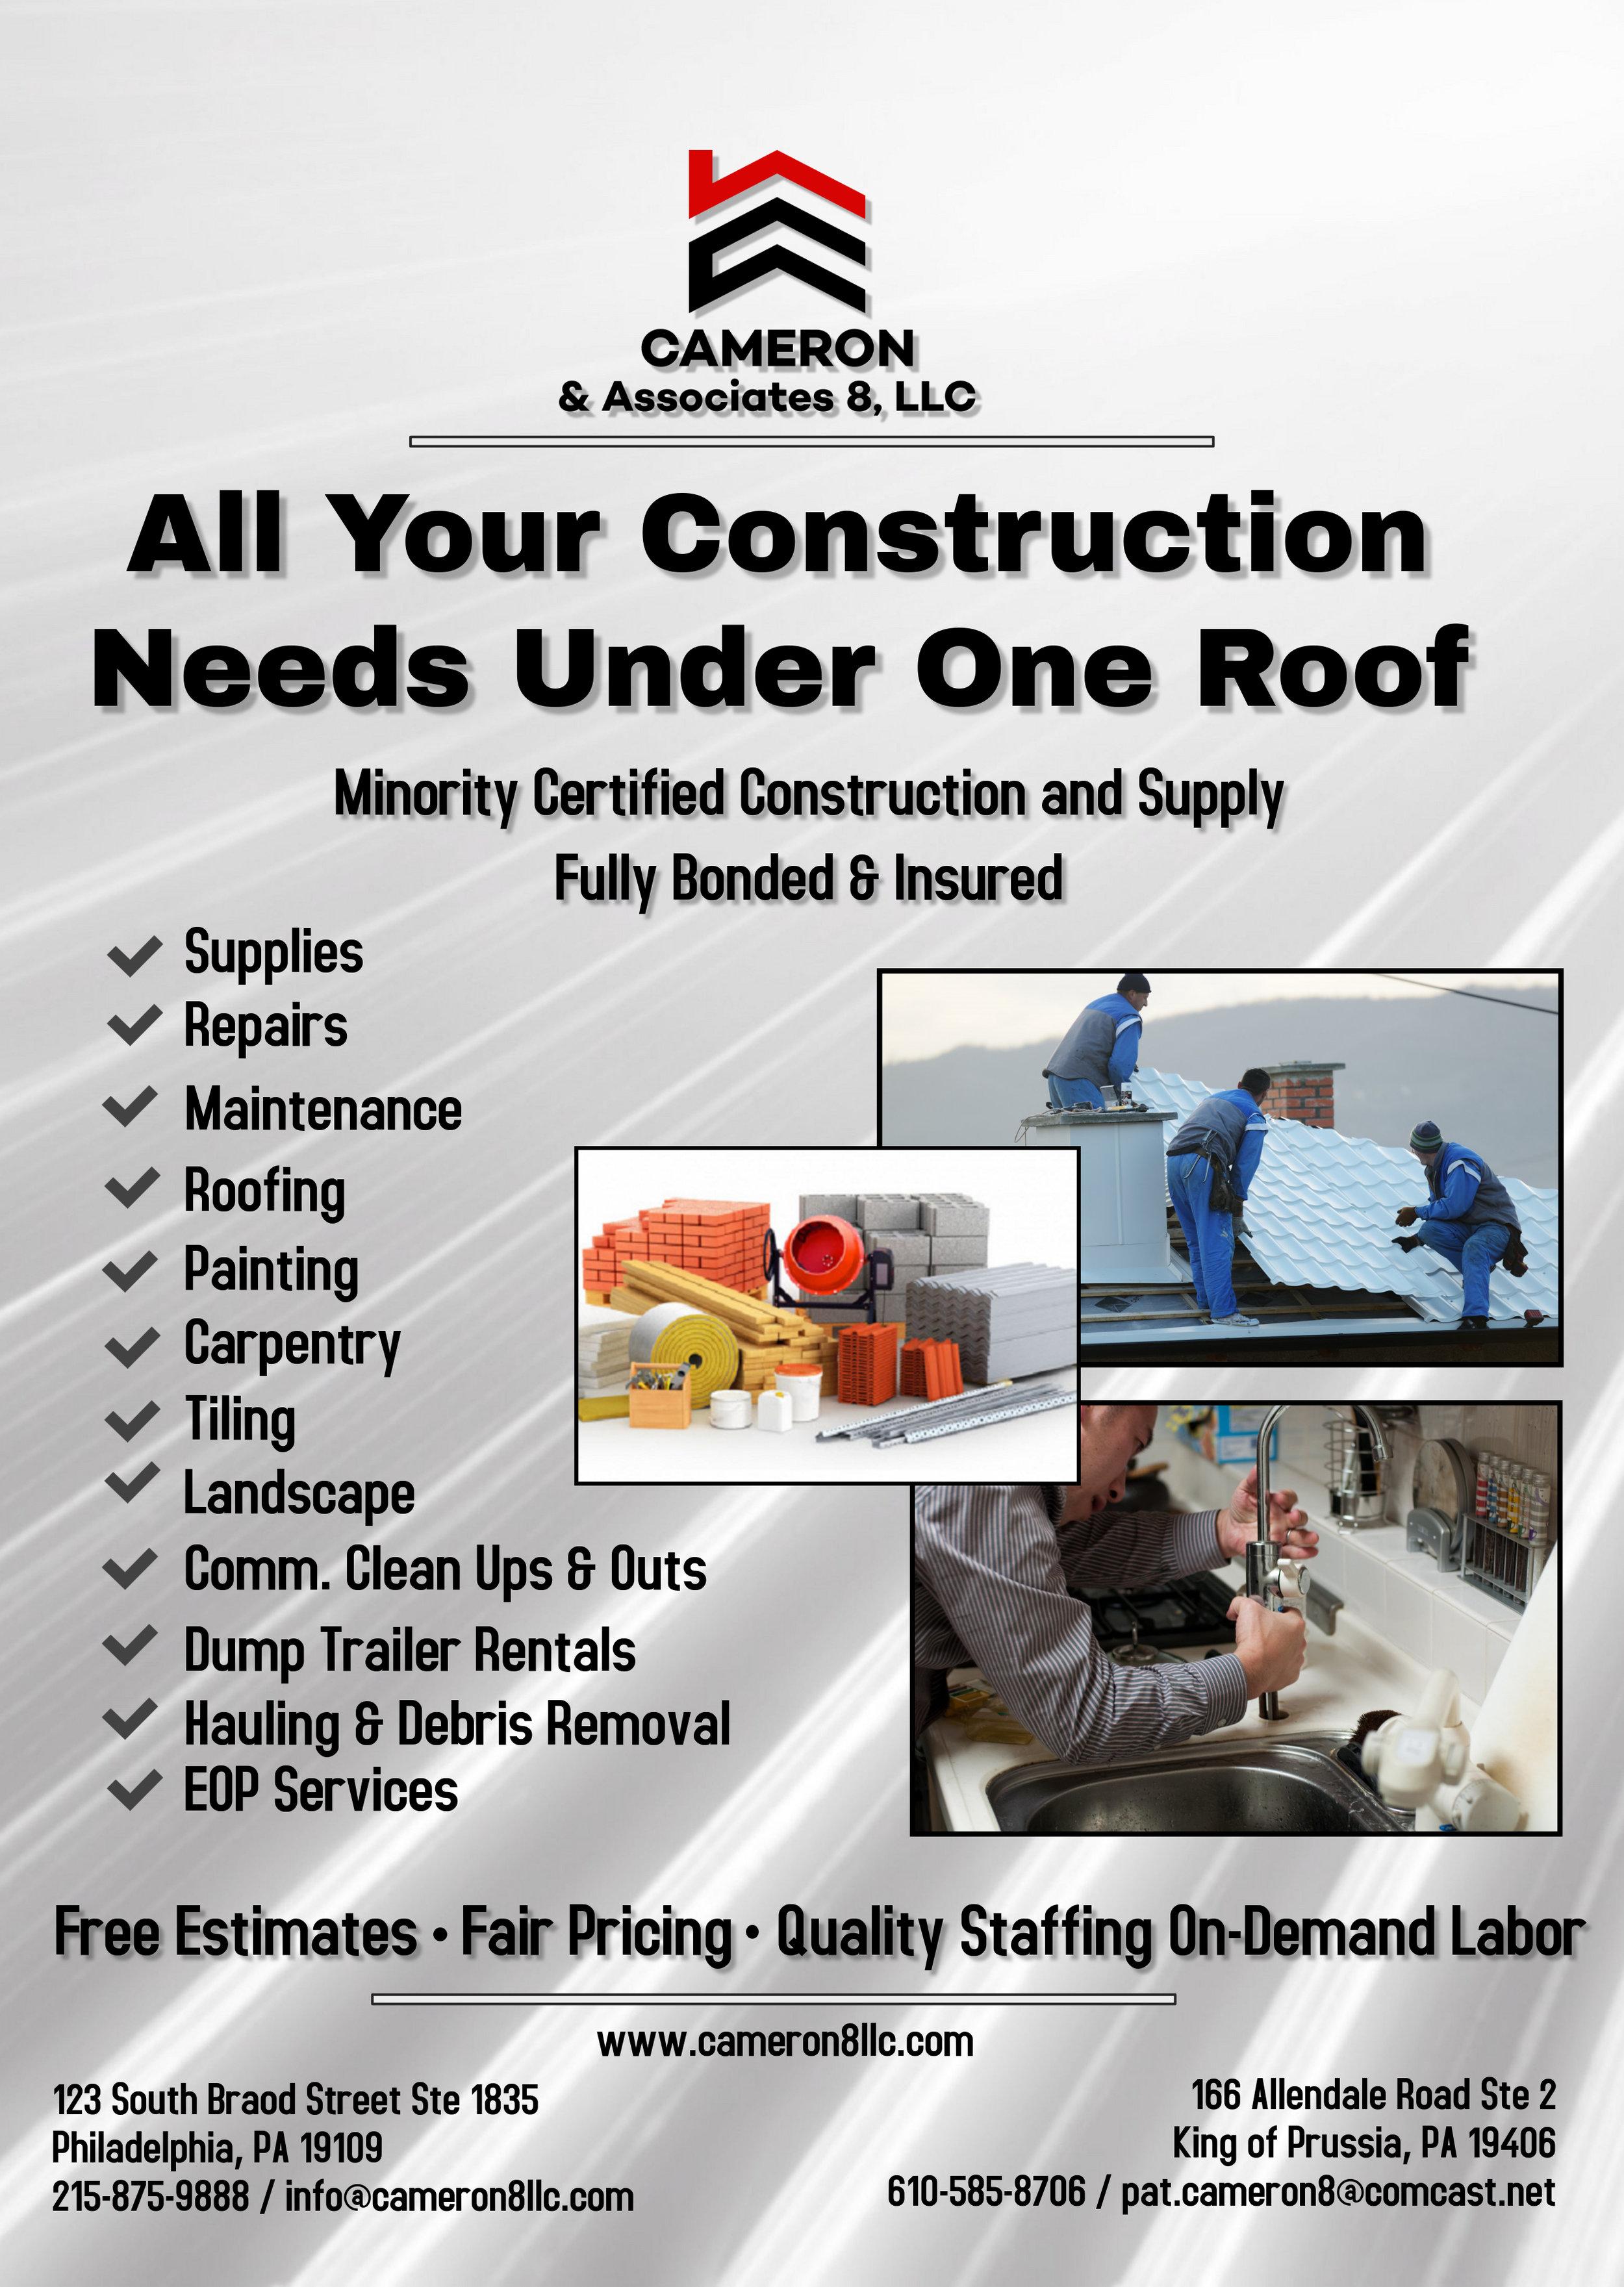 Construction Services Flyer (4).jpg